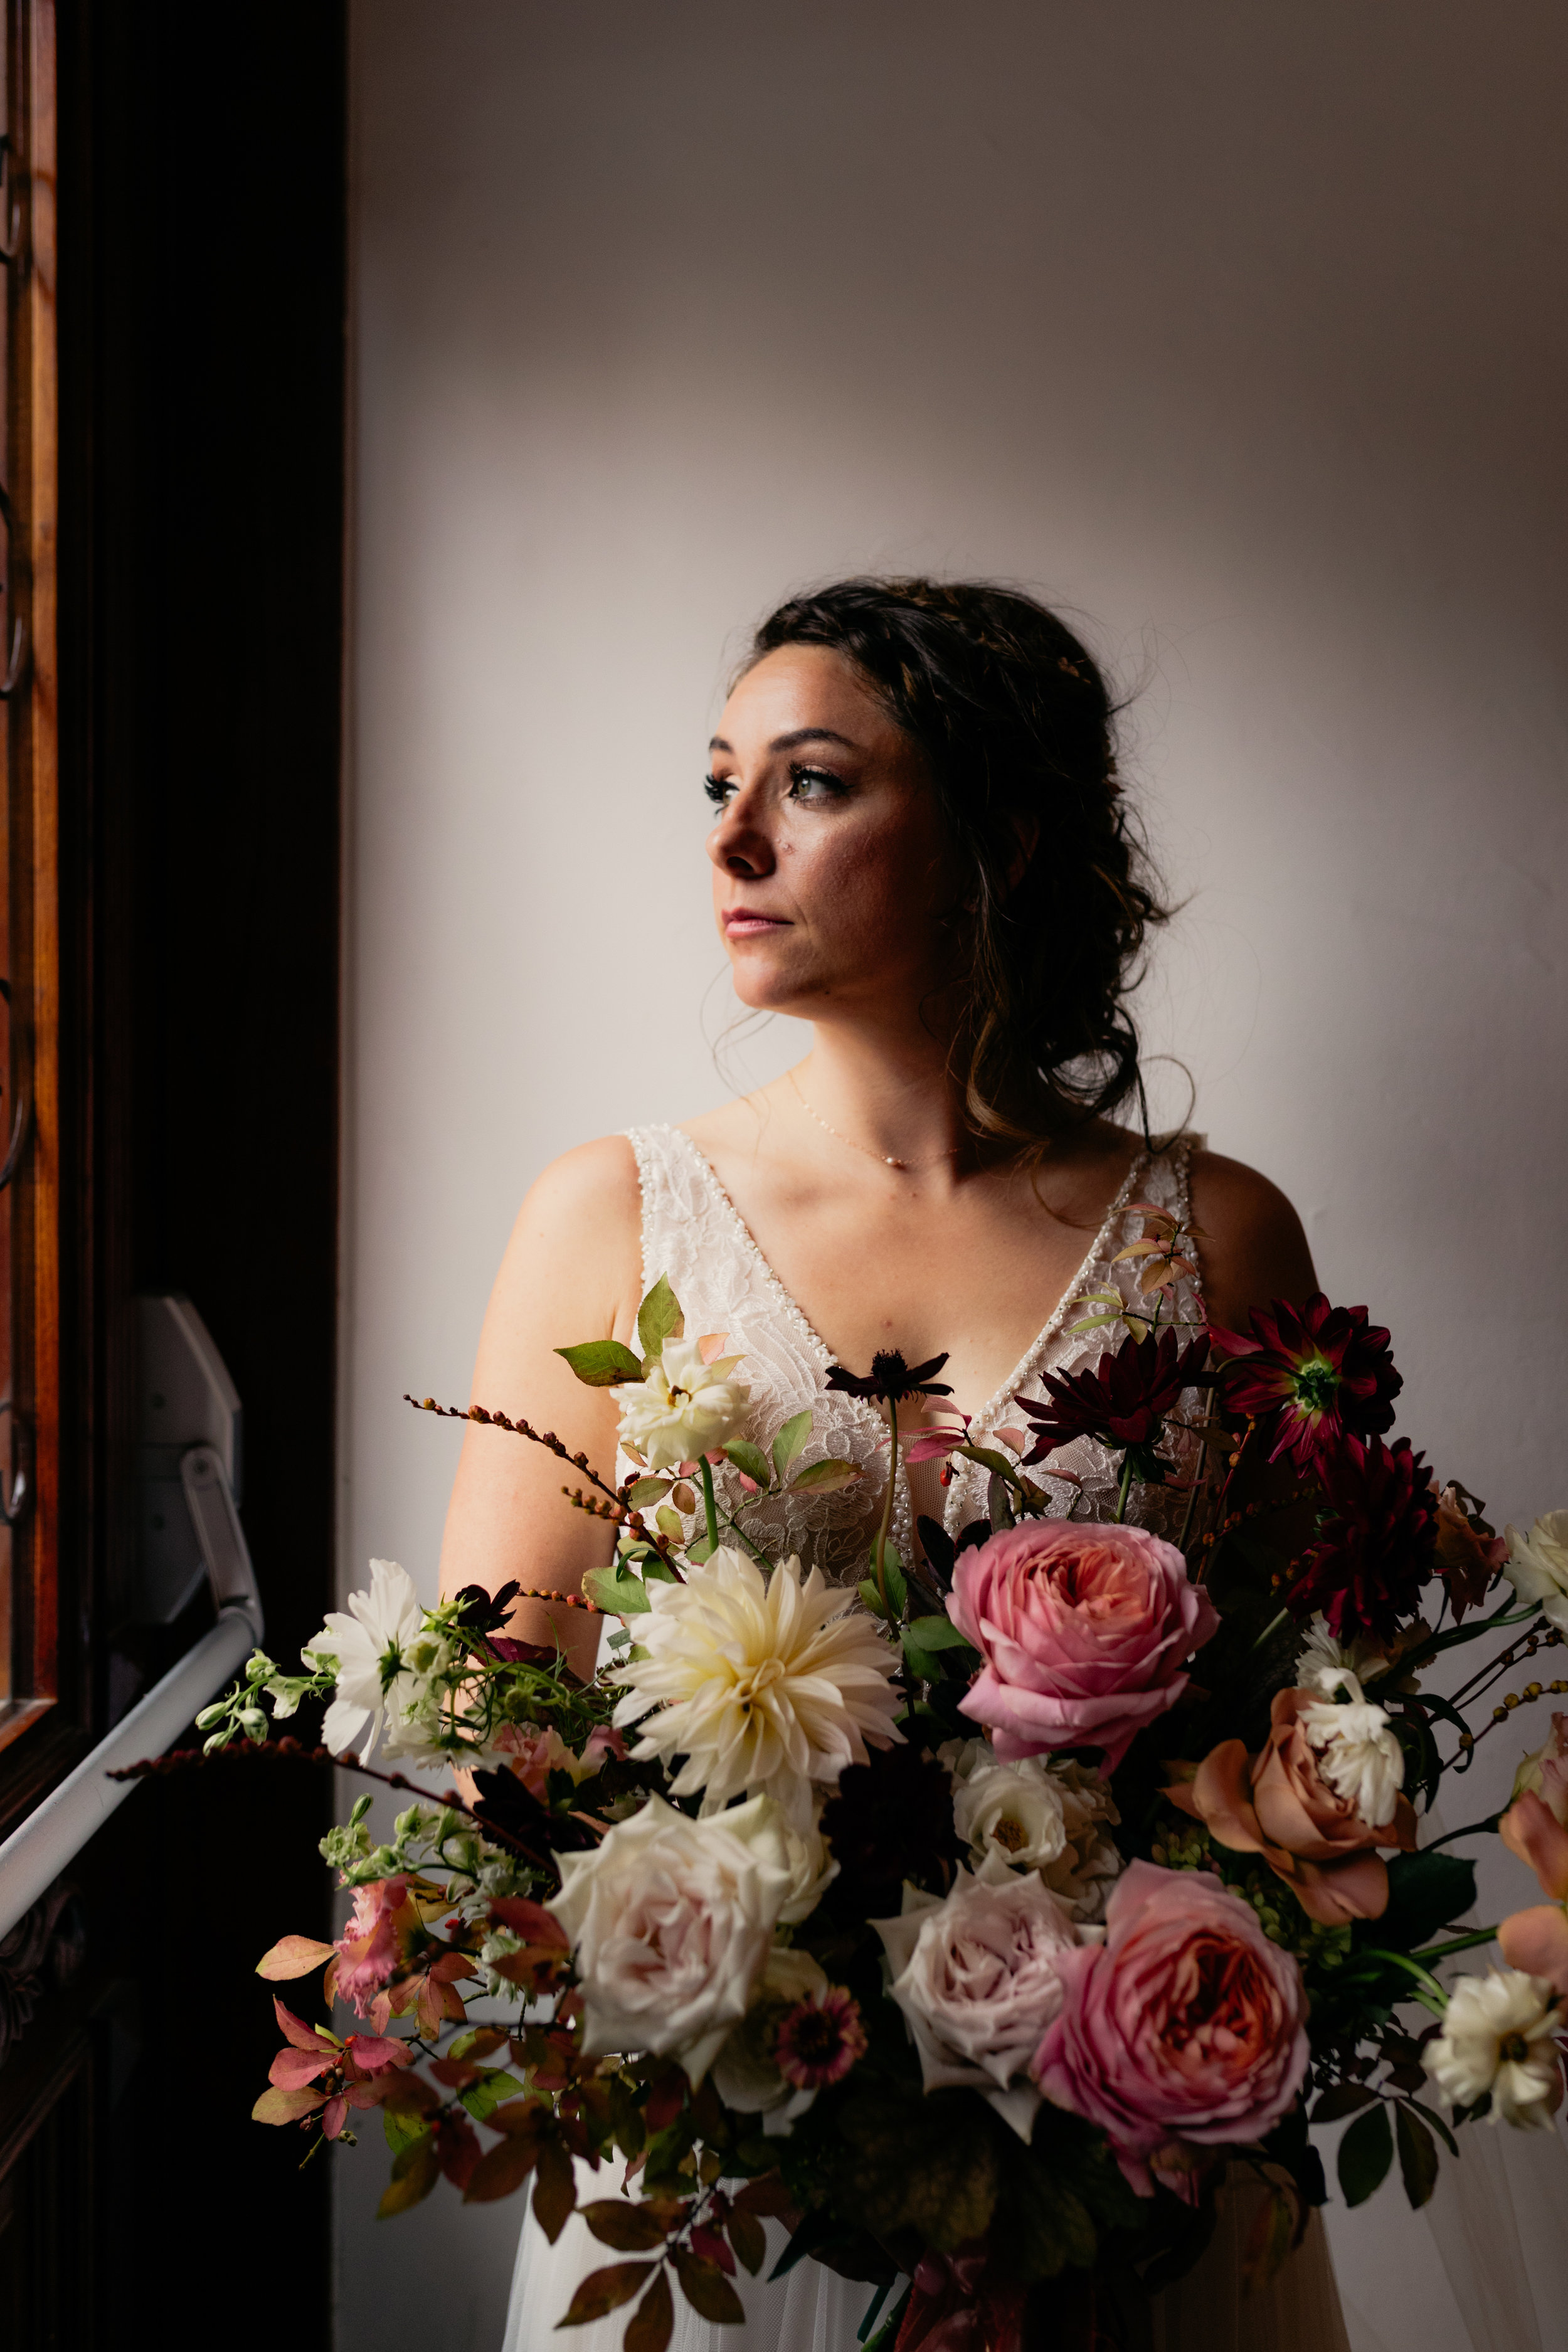 #bridalmakeupartist#bridalbeauty #makeup by #torontomakeupartist #ecobeautyprofessional Maya Goldenberg @thebishahotel  #Toronto Photo by Kayla Rocca